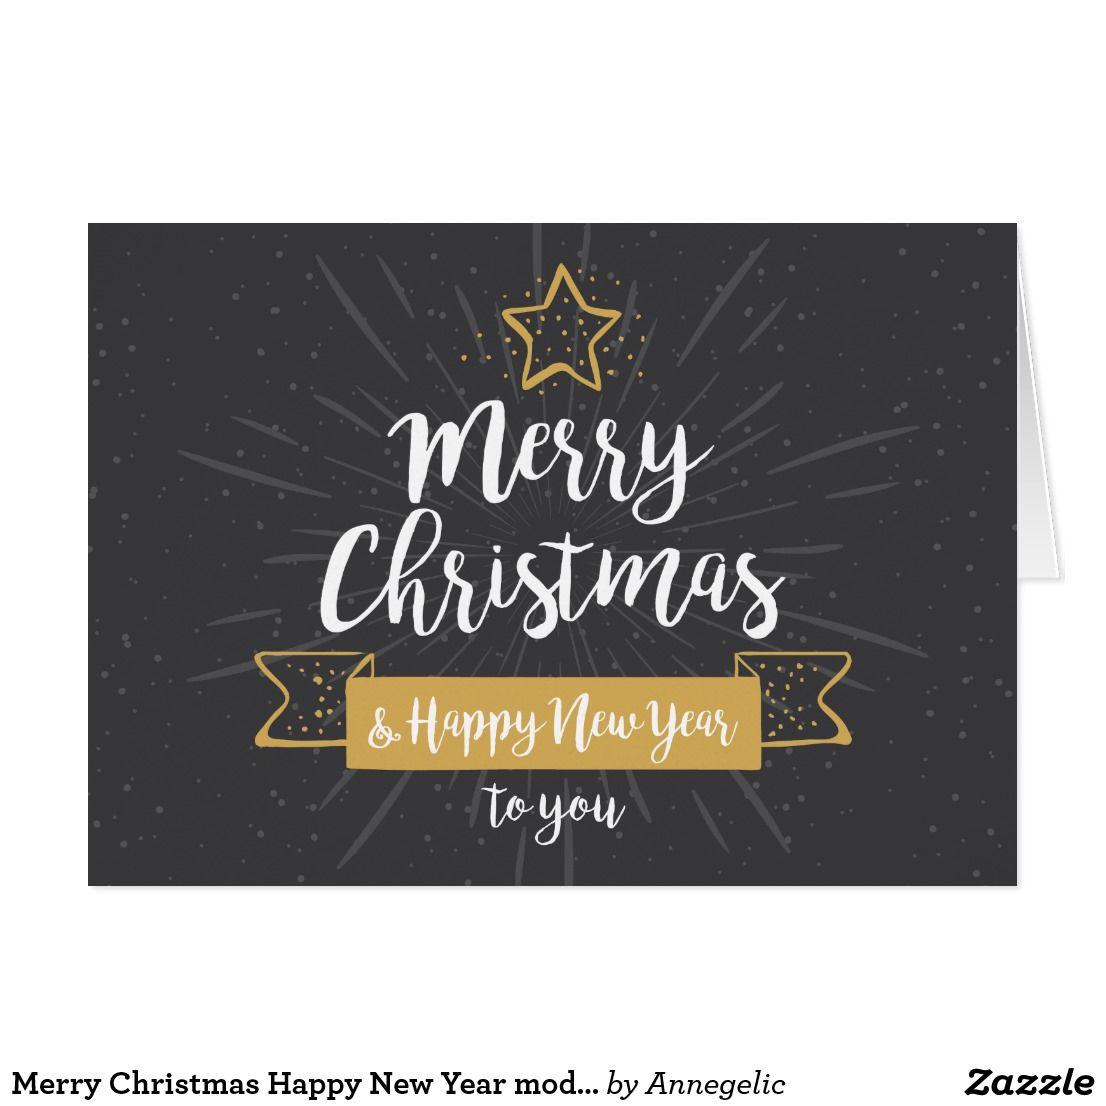 Merry Christmas Happy New Year Modern Handwritten Holiday Card Zazzle Com Merry Christmas Quotes Christmas Quotes Merry Christmas Quotes Christian